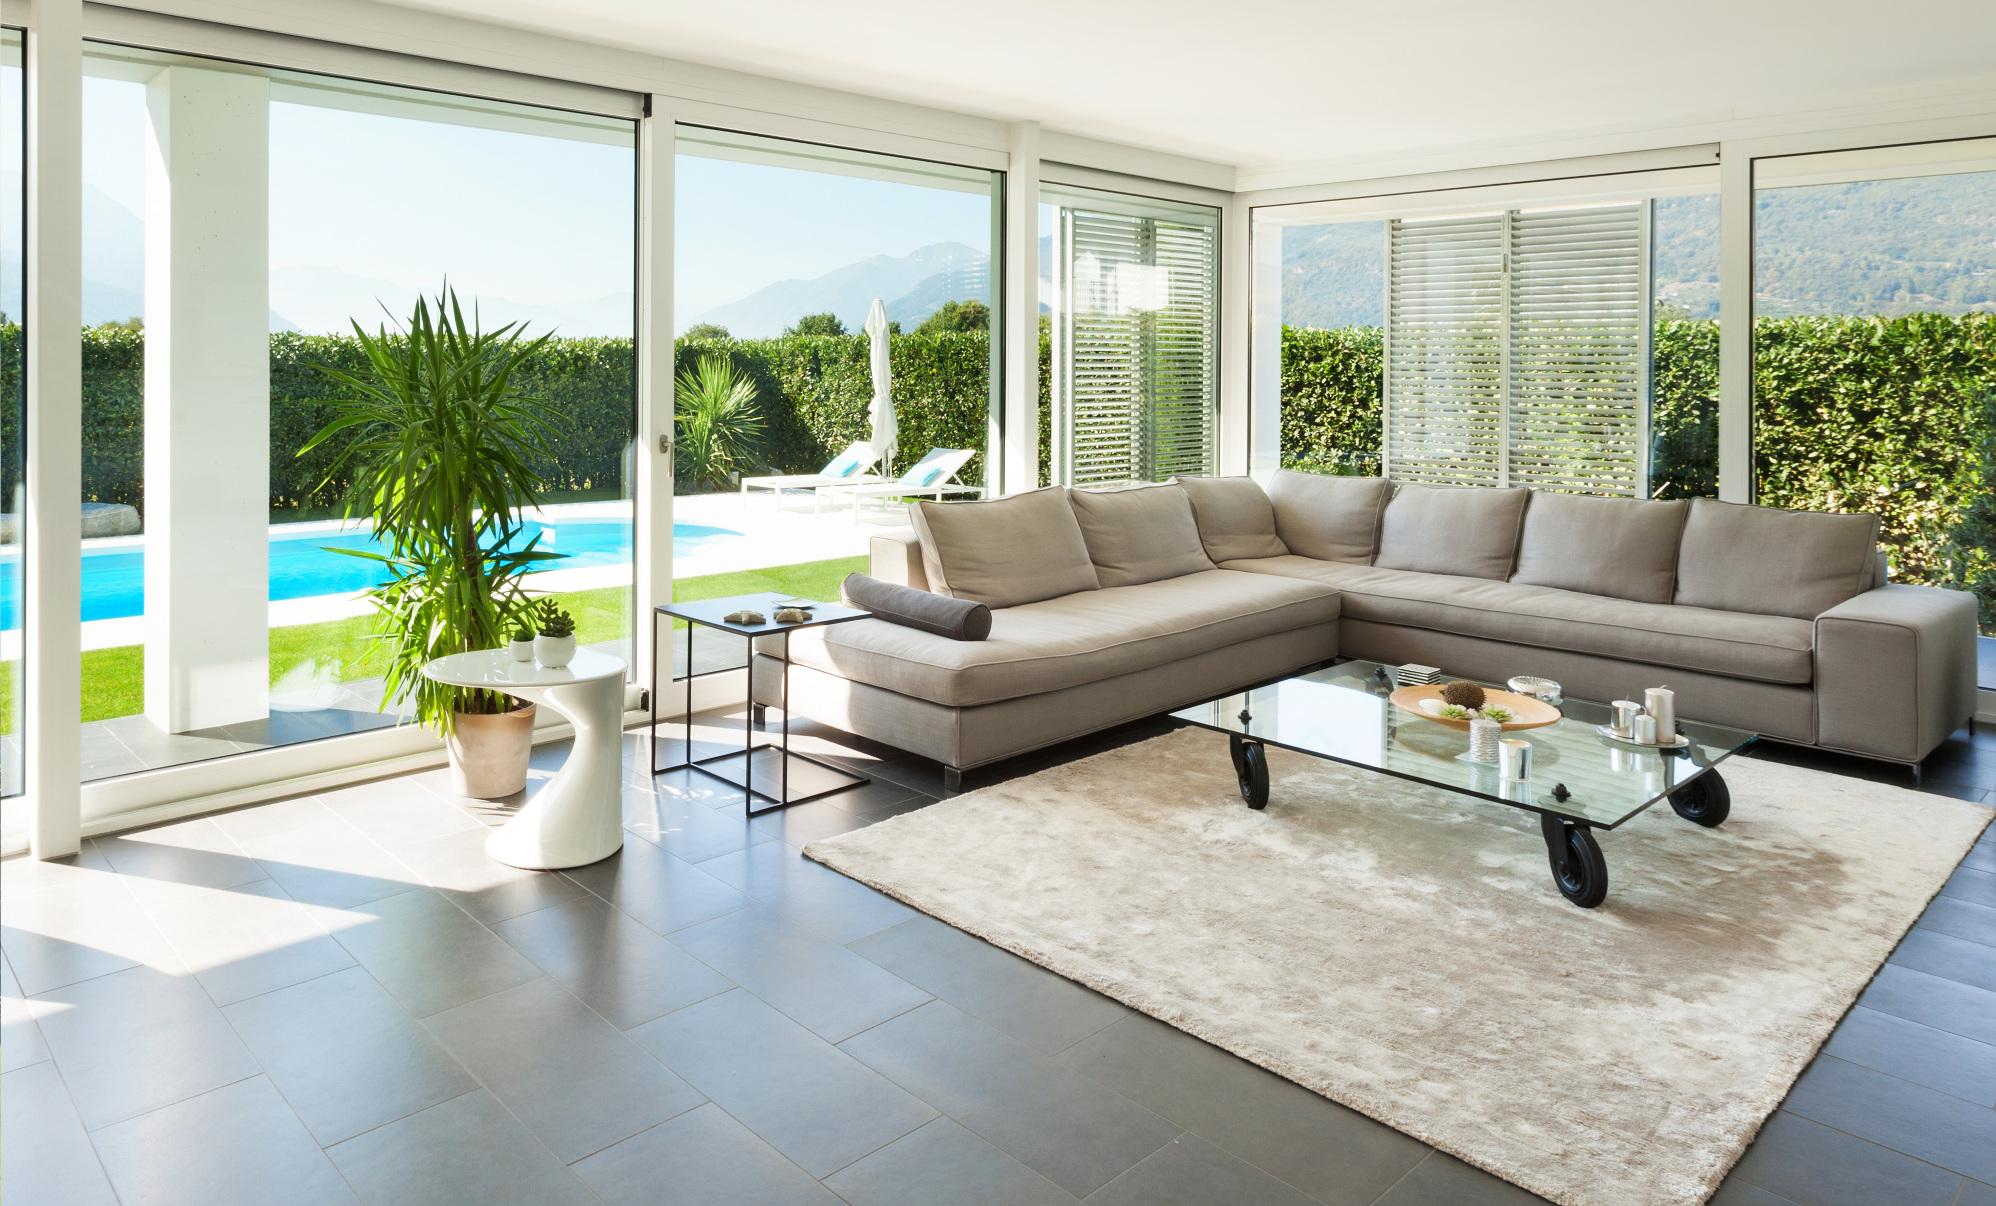 Decorador de interiores sevilla best decoracion baos for Decorador de interiores